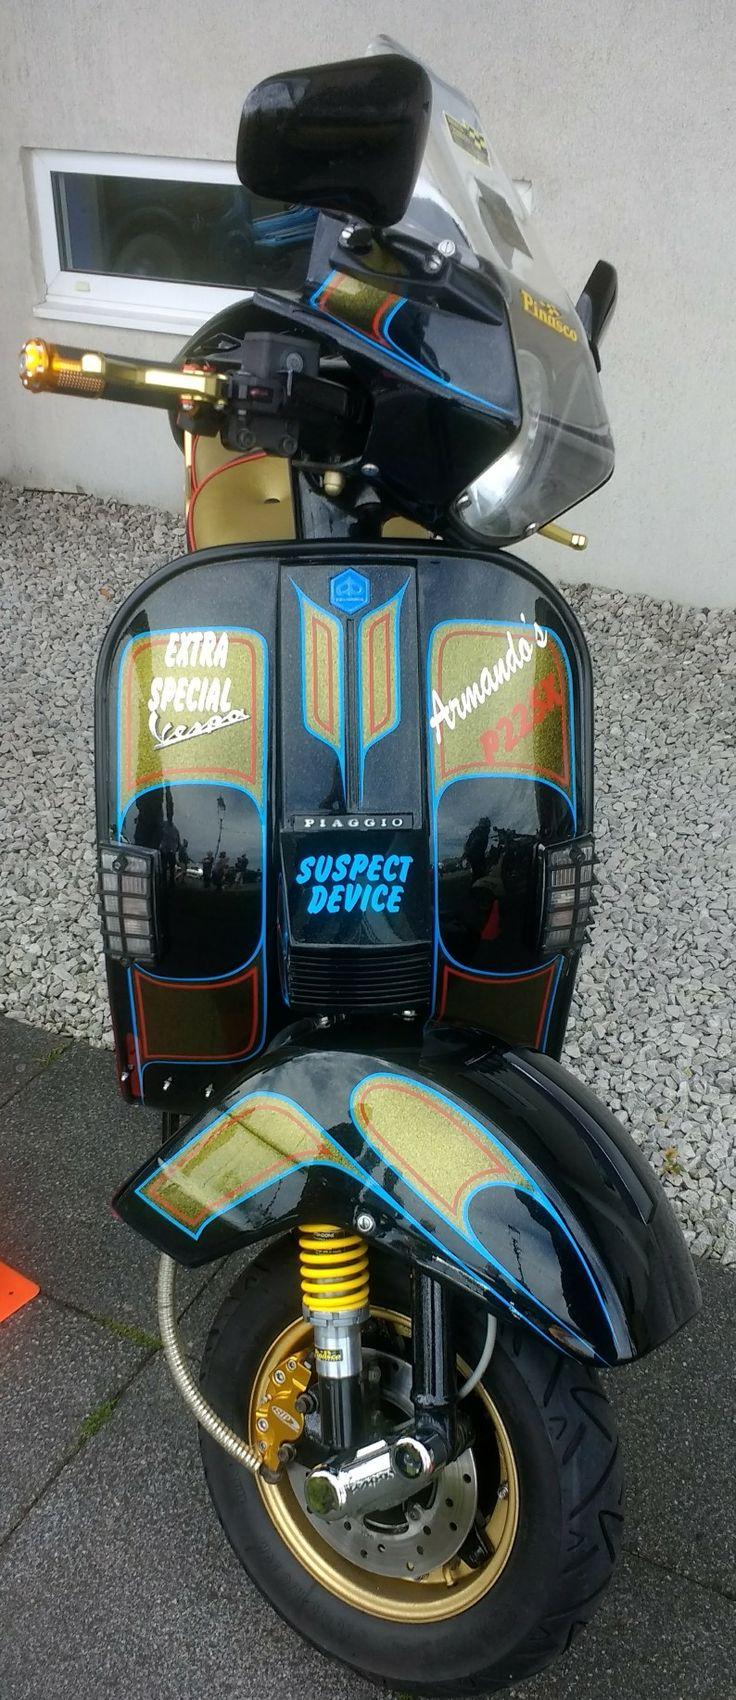 Llandudno national scooter rally custom show